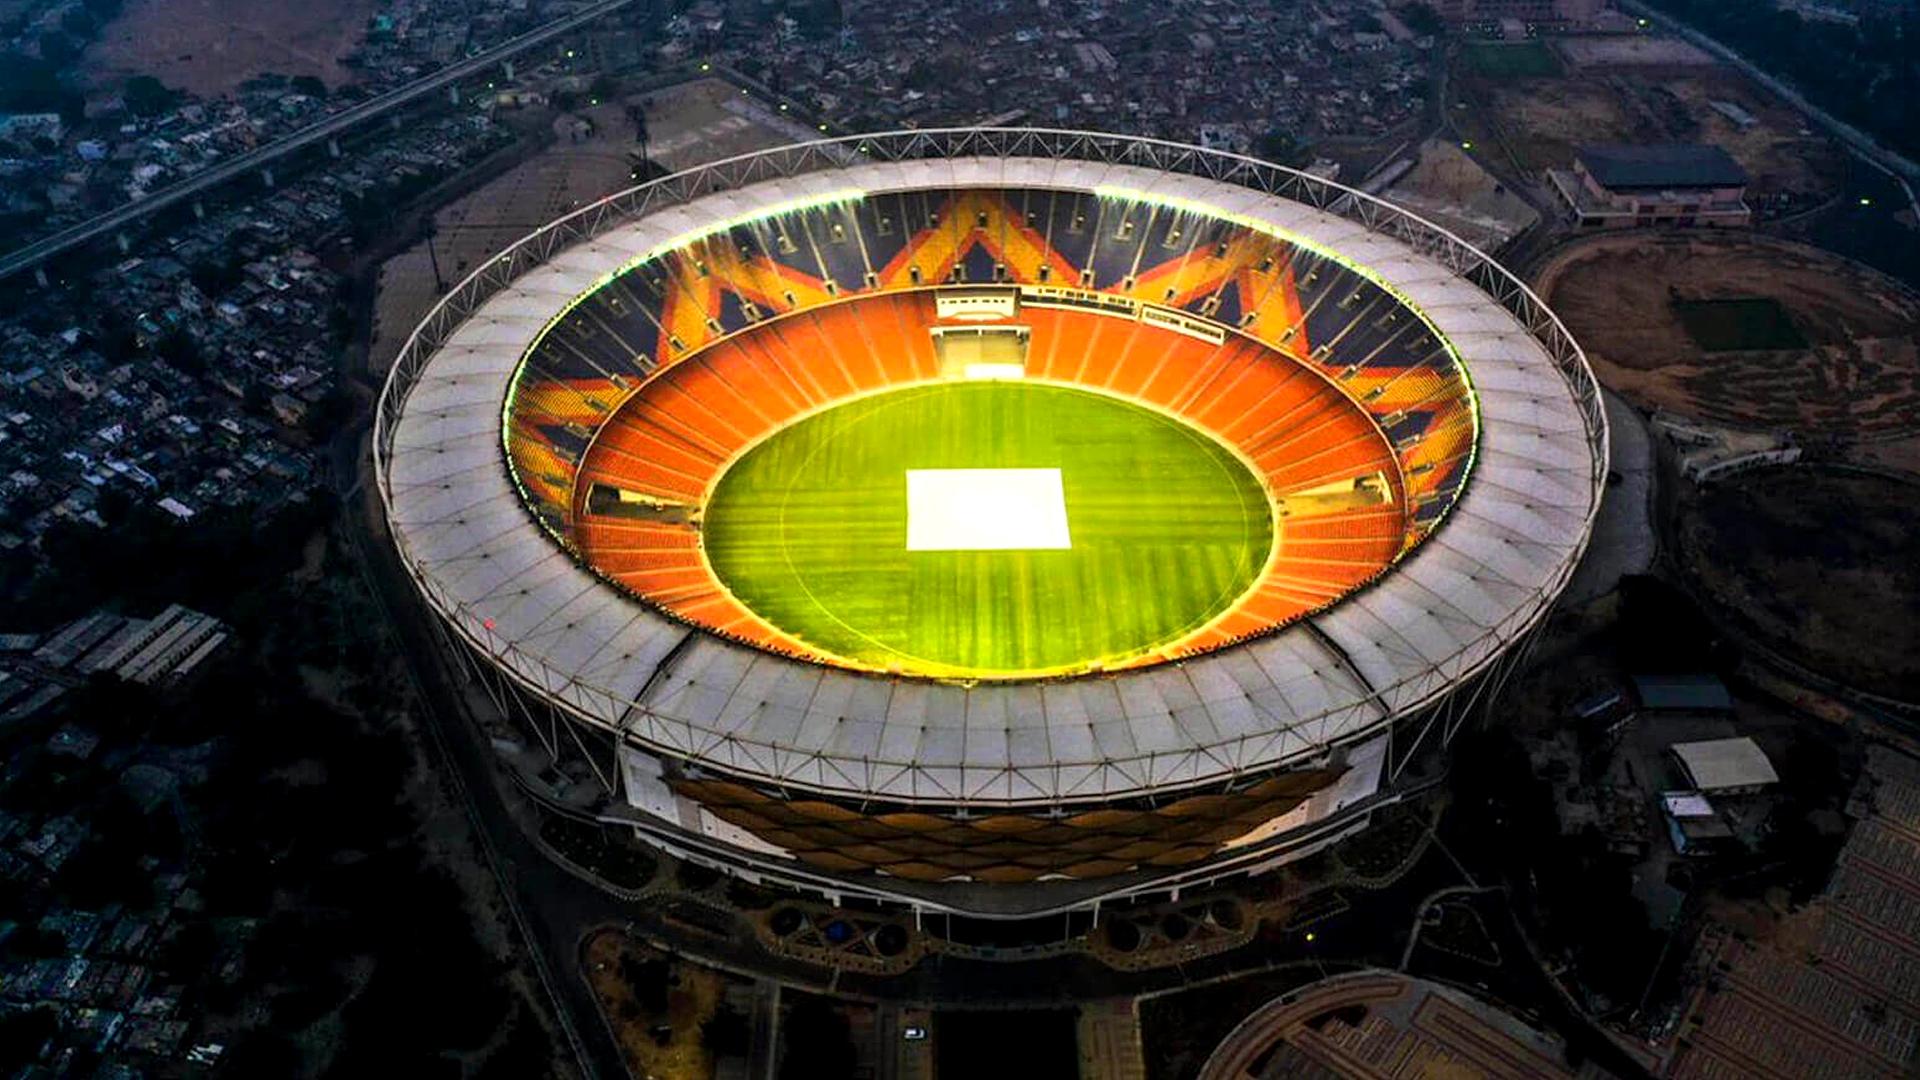 Ducks, Spider-Man, And Political Barbs At World's Largest Cricket Stadium